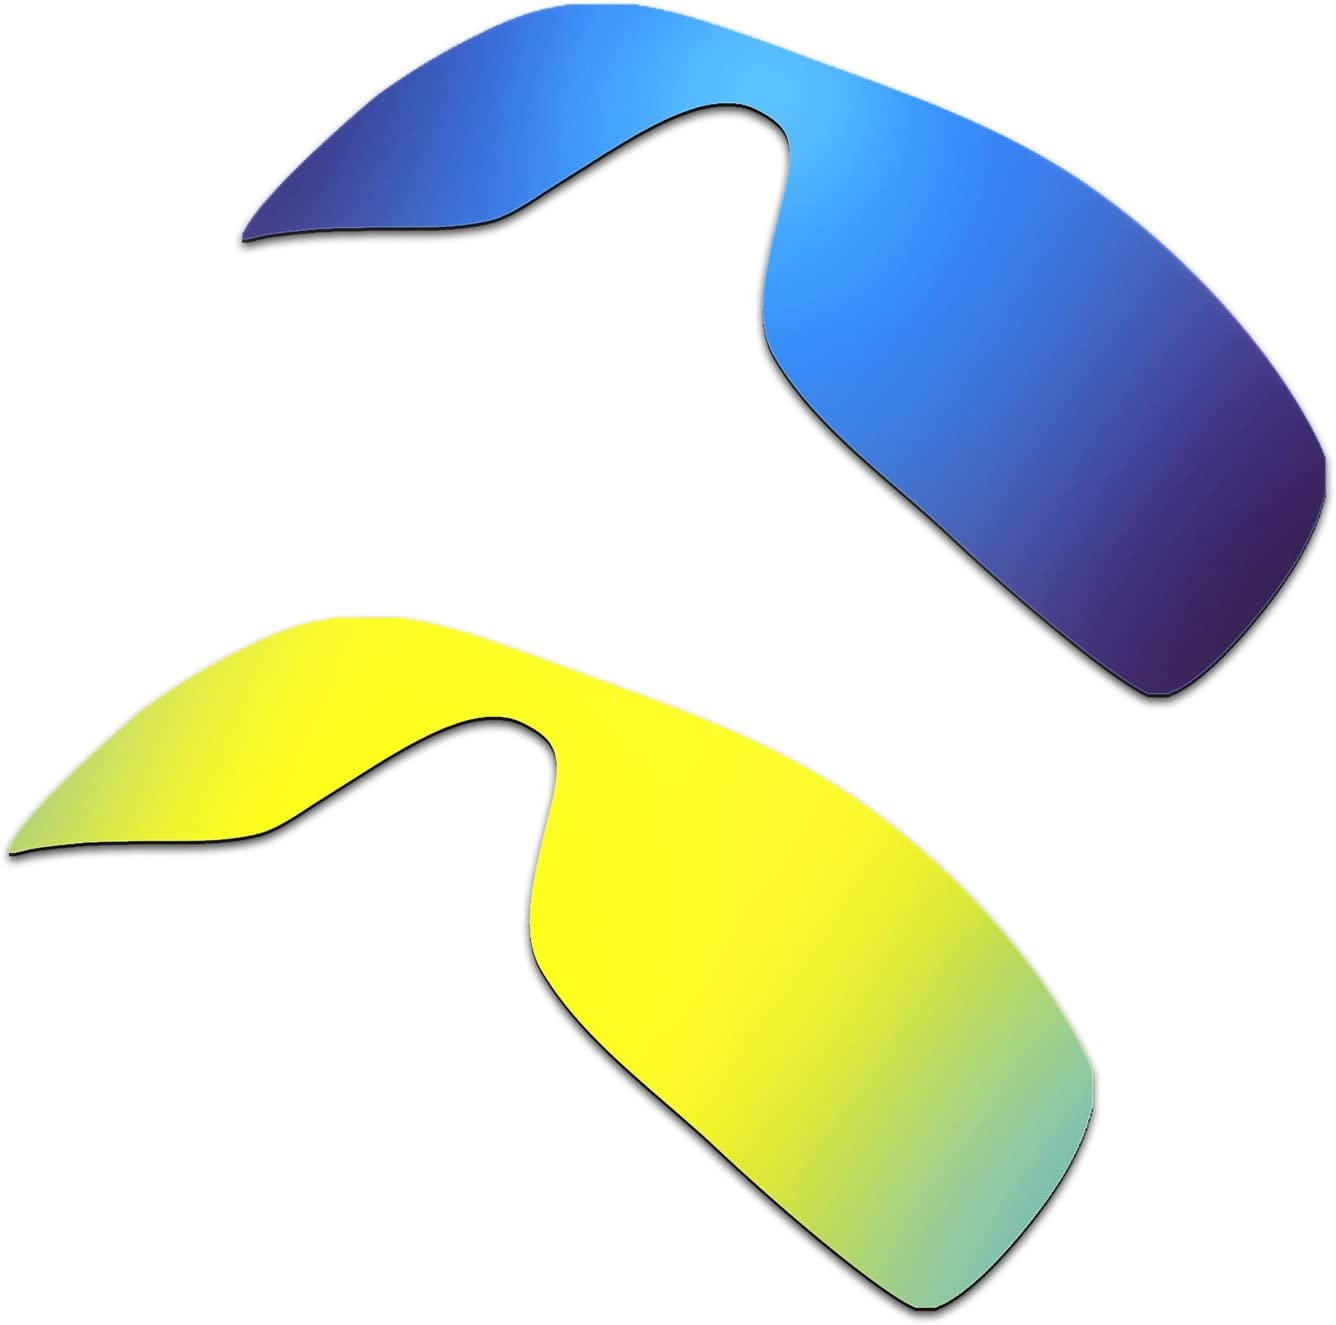 HKUCO Mens Replacement Lenses for Oakley Batwolf Sunglasses Blue/24k Gold